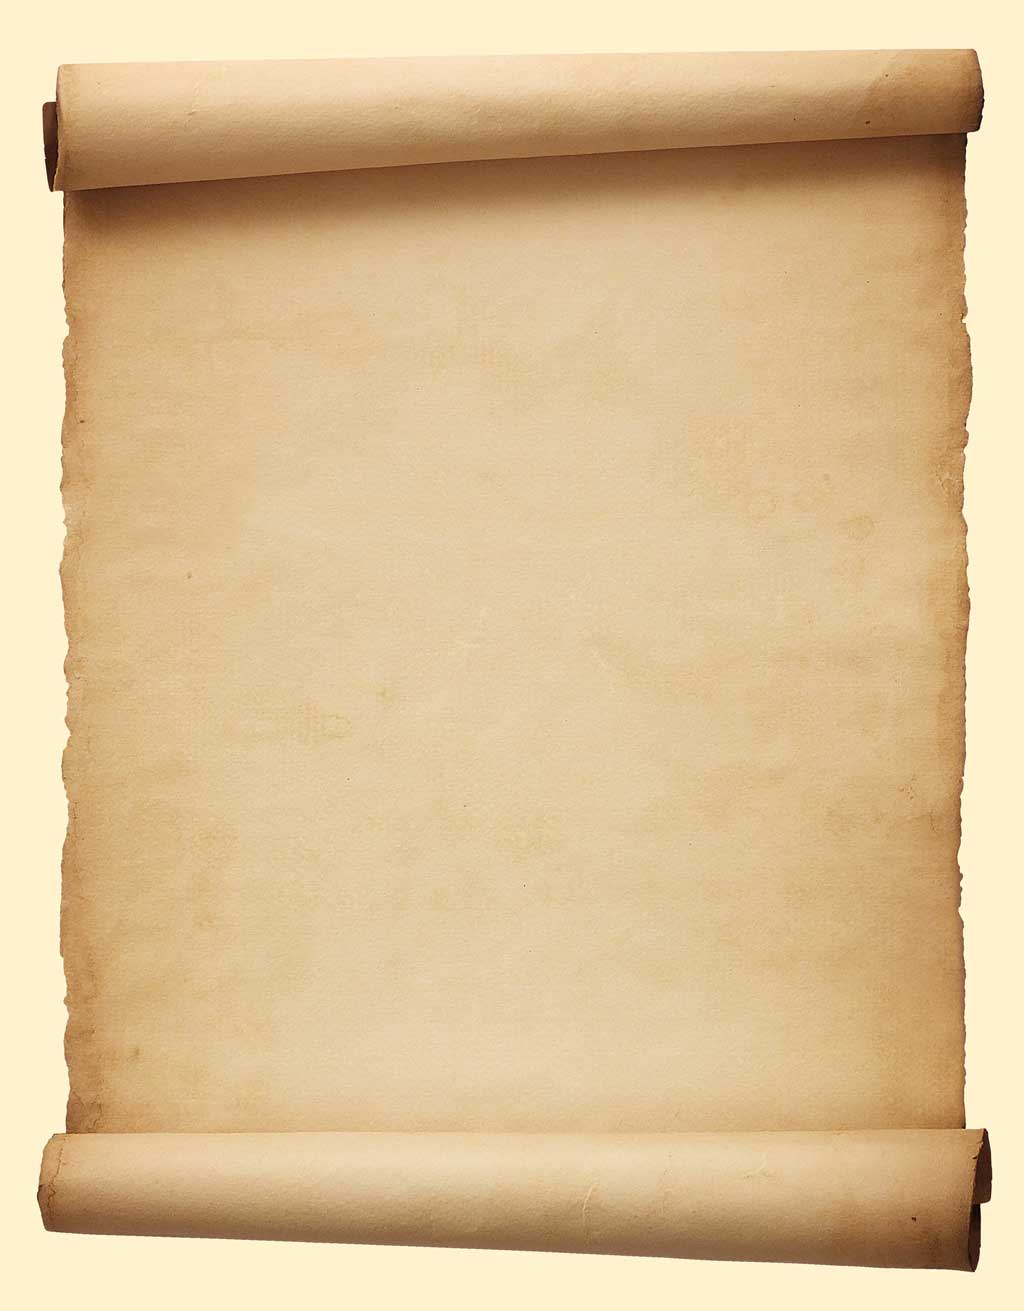 Letter Backgrounds Image - Wallpaper Cave